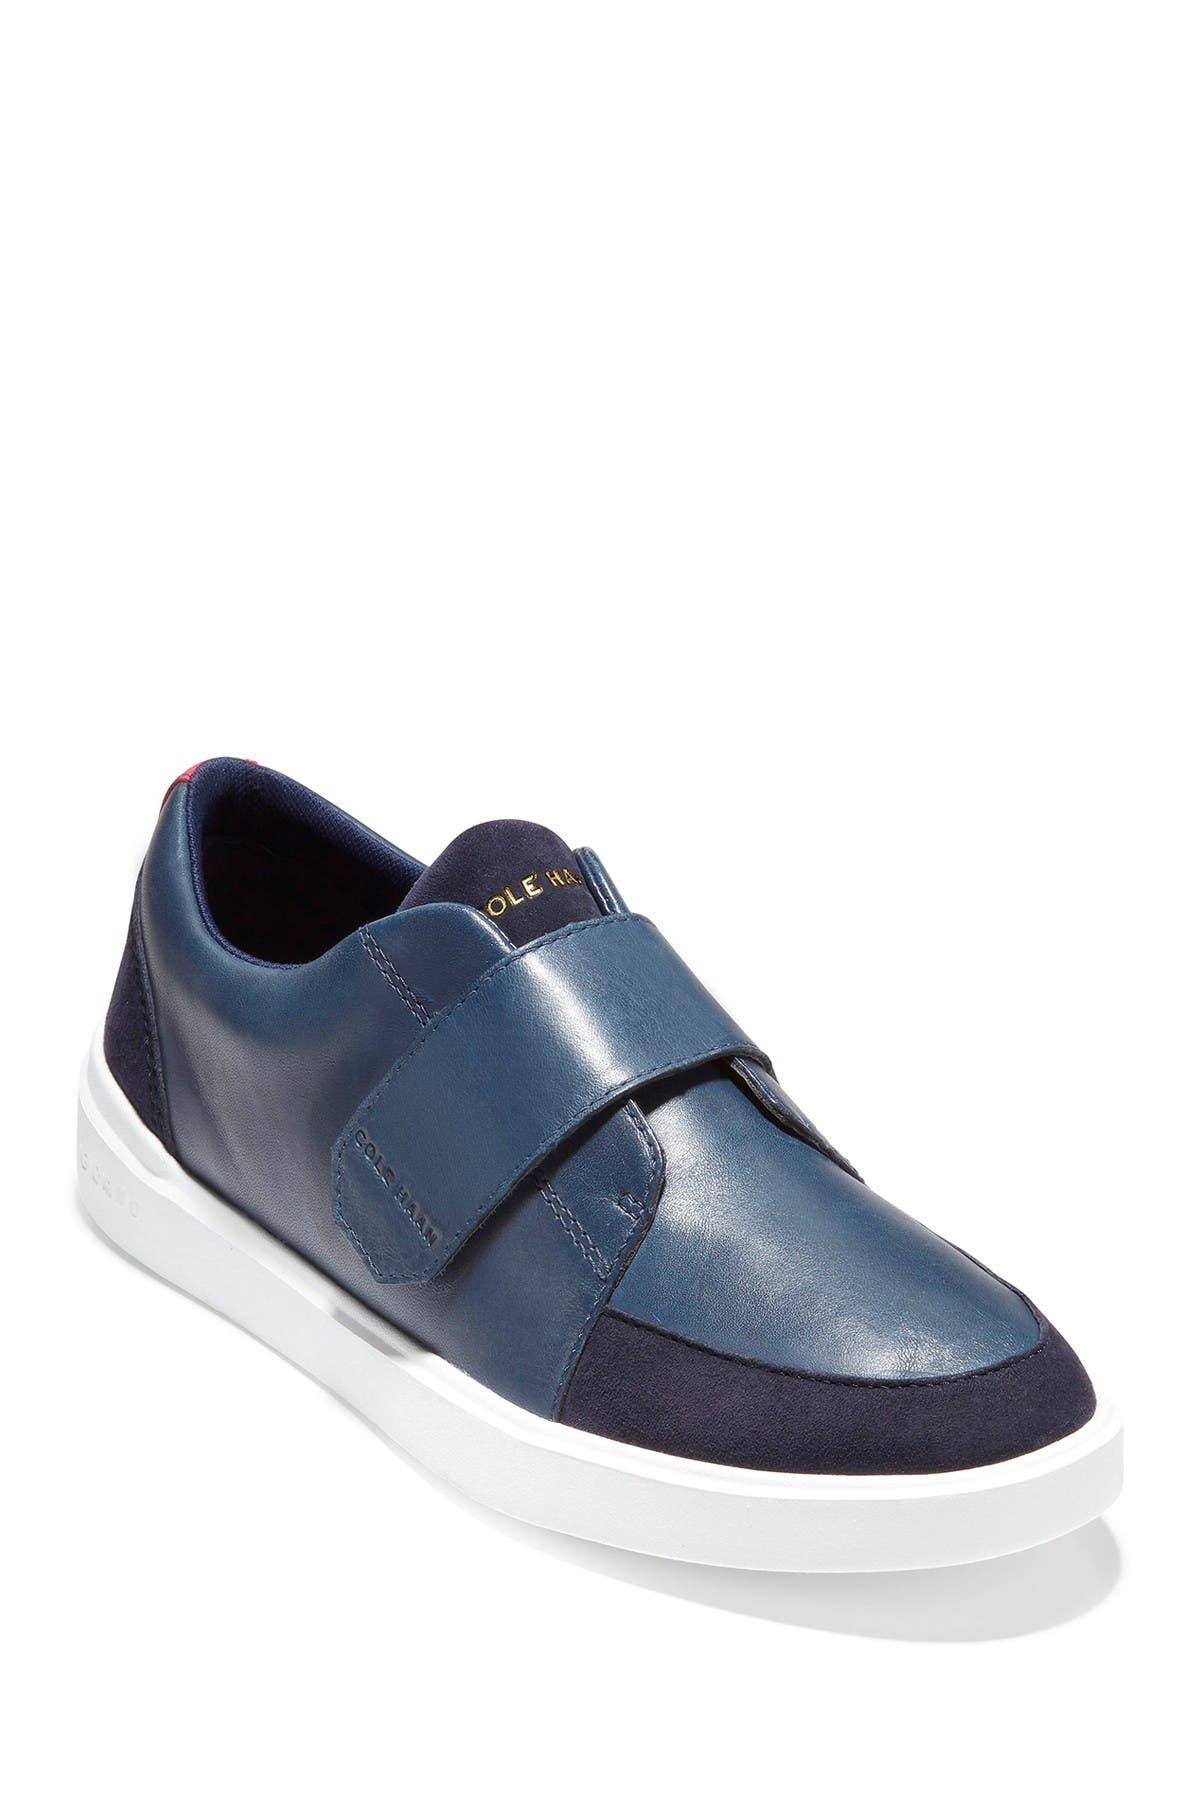 Image of Cole Haan Grand Crosscourt Monk Strap City Sneaker